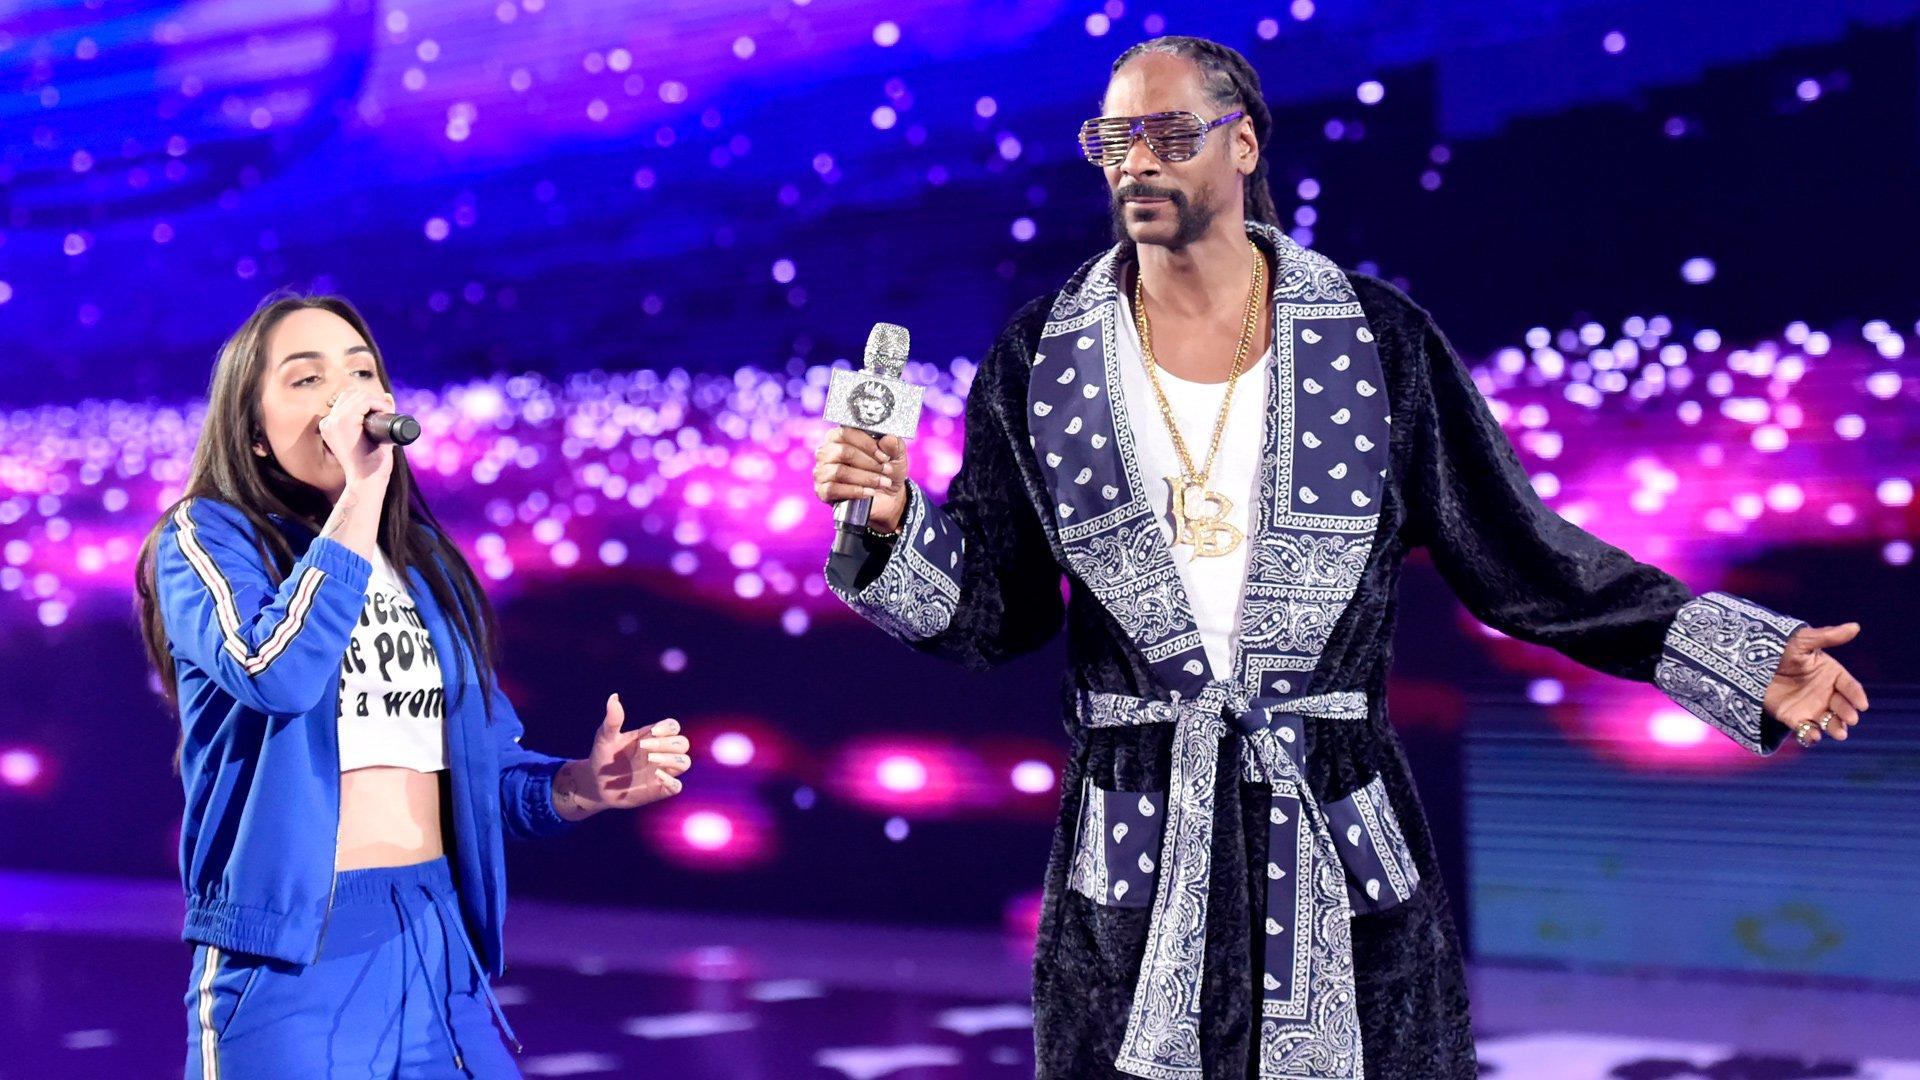 Best WrestleMania musical performances